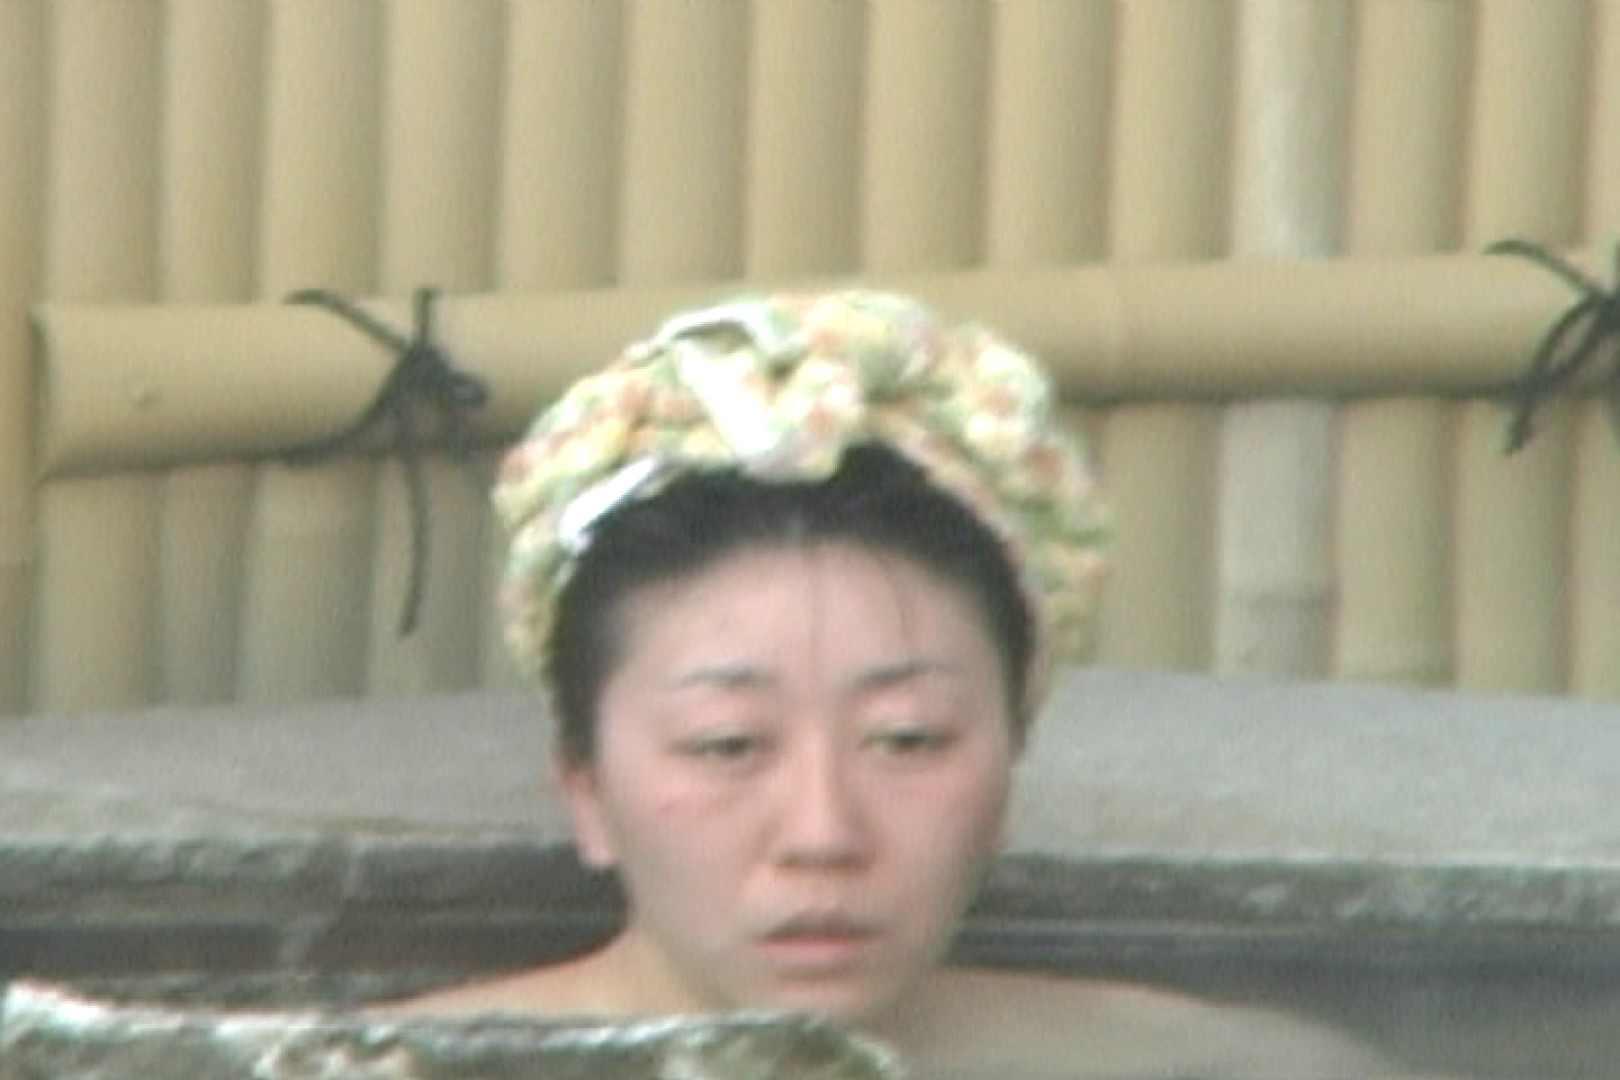 Aquaな露天風呂Vol.594 0   0  90連発 49